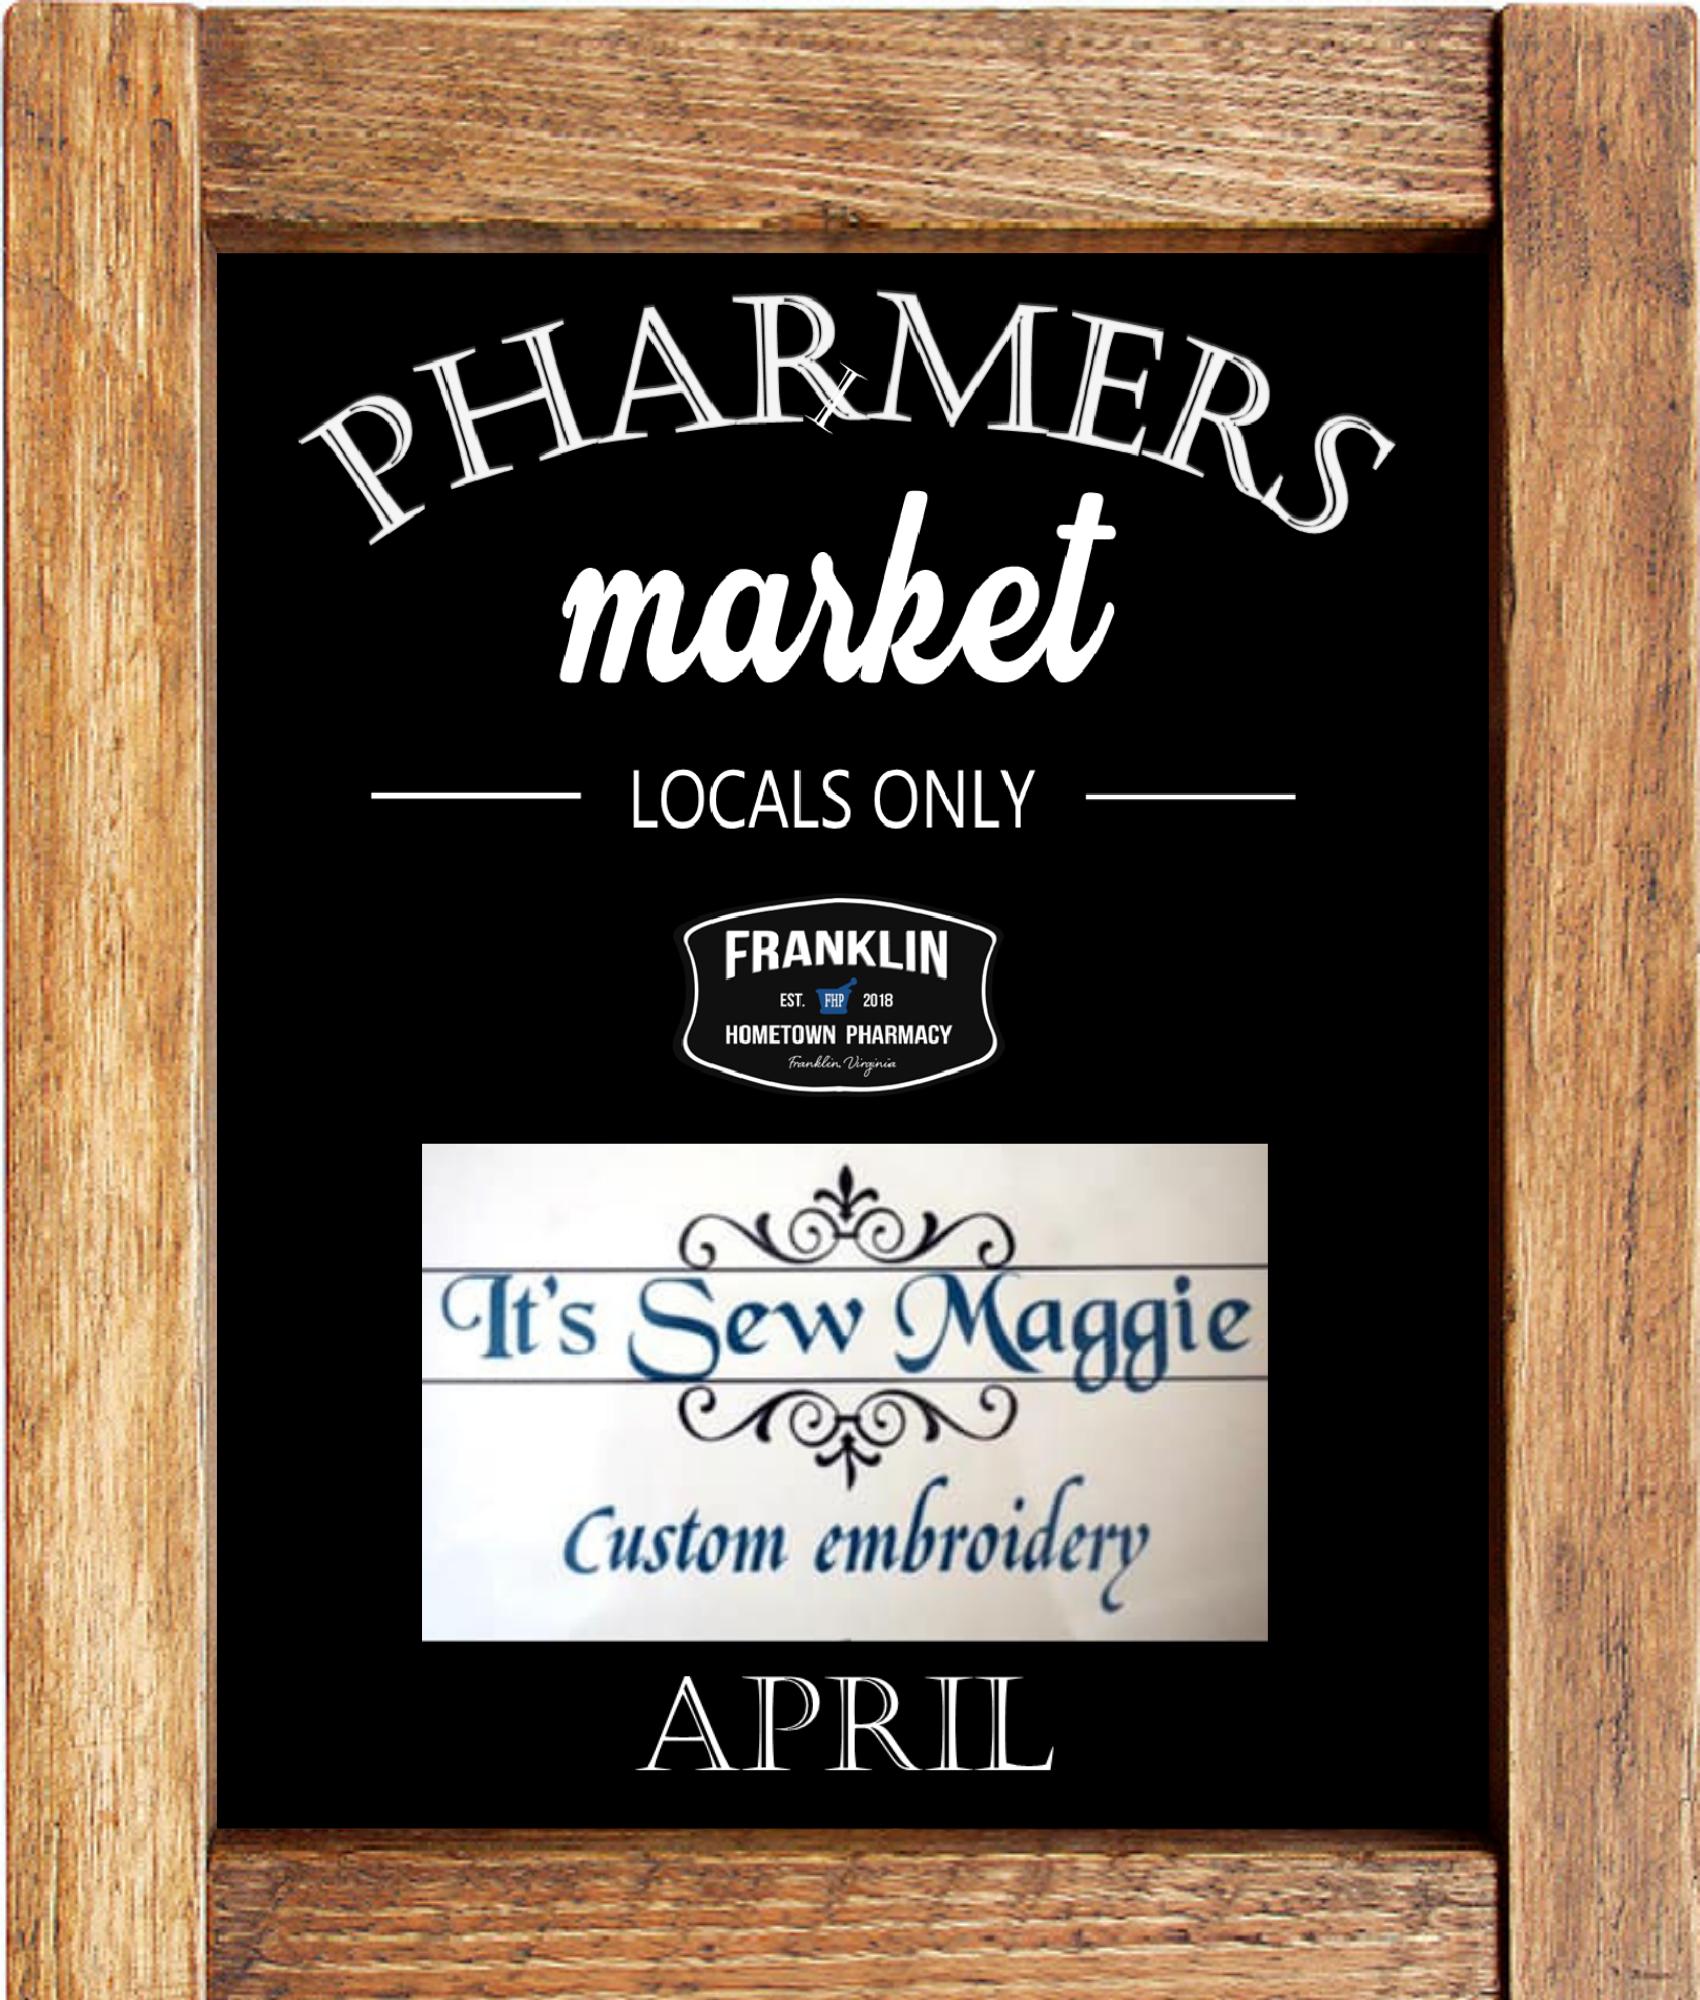 Pharmers Market April 21 Combo.png